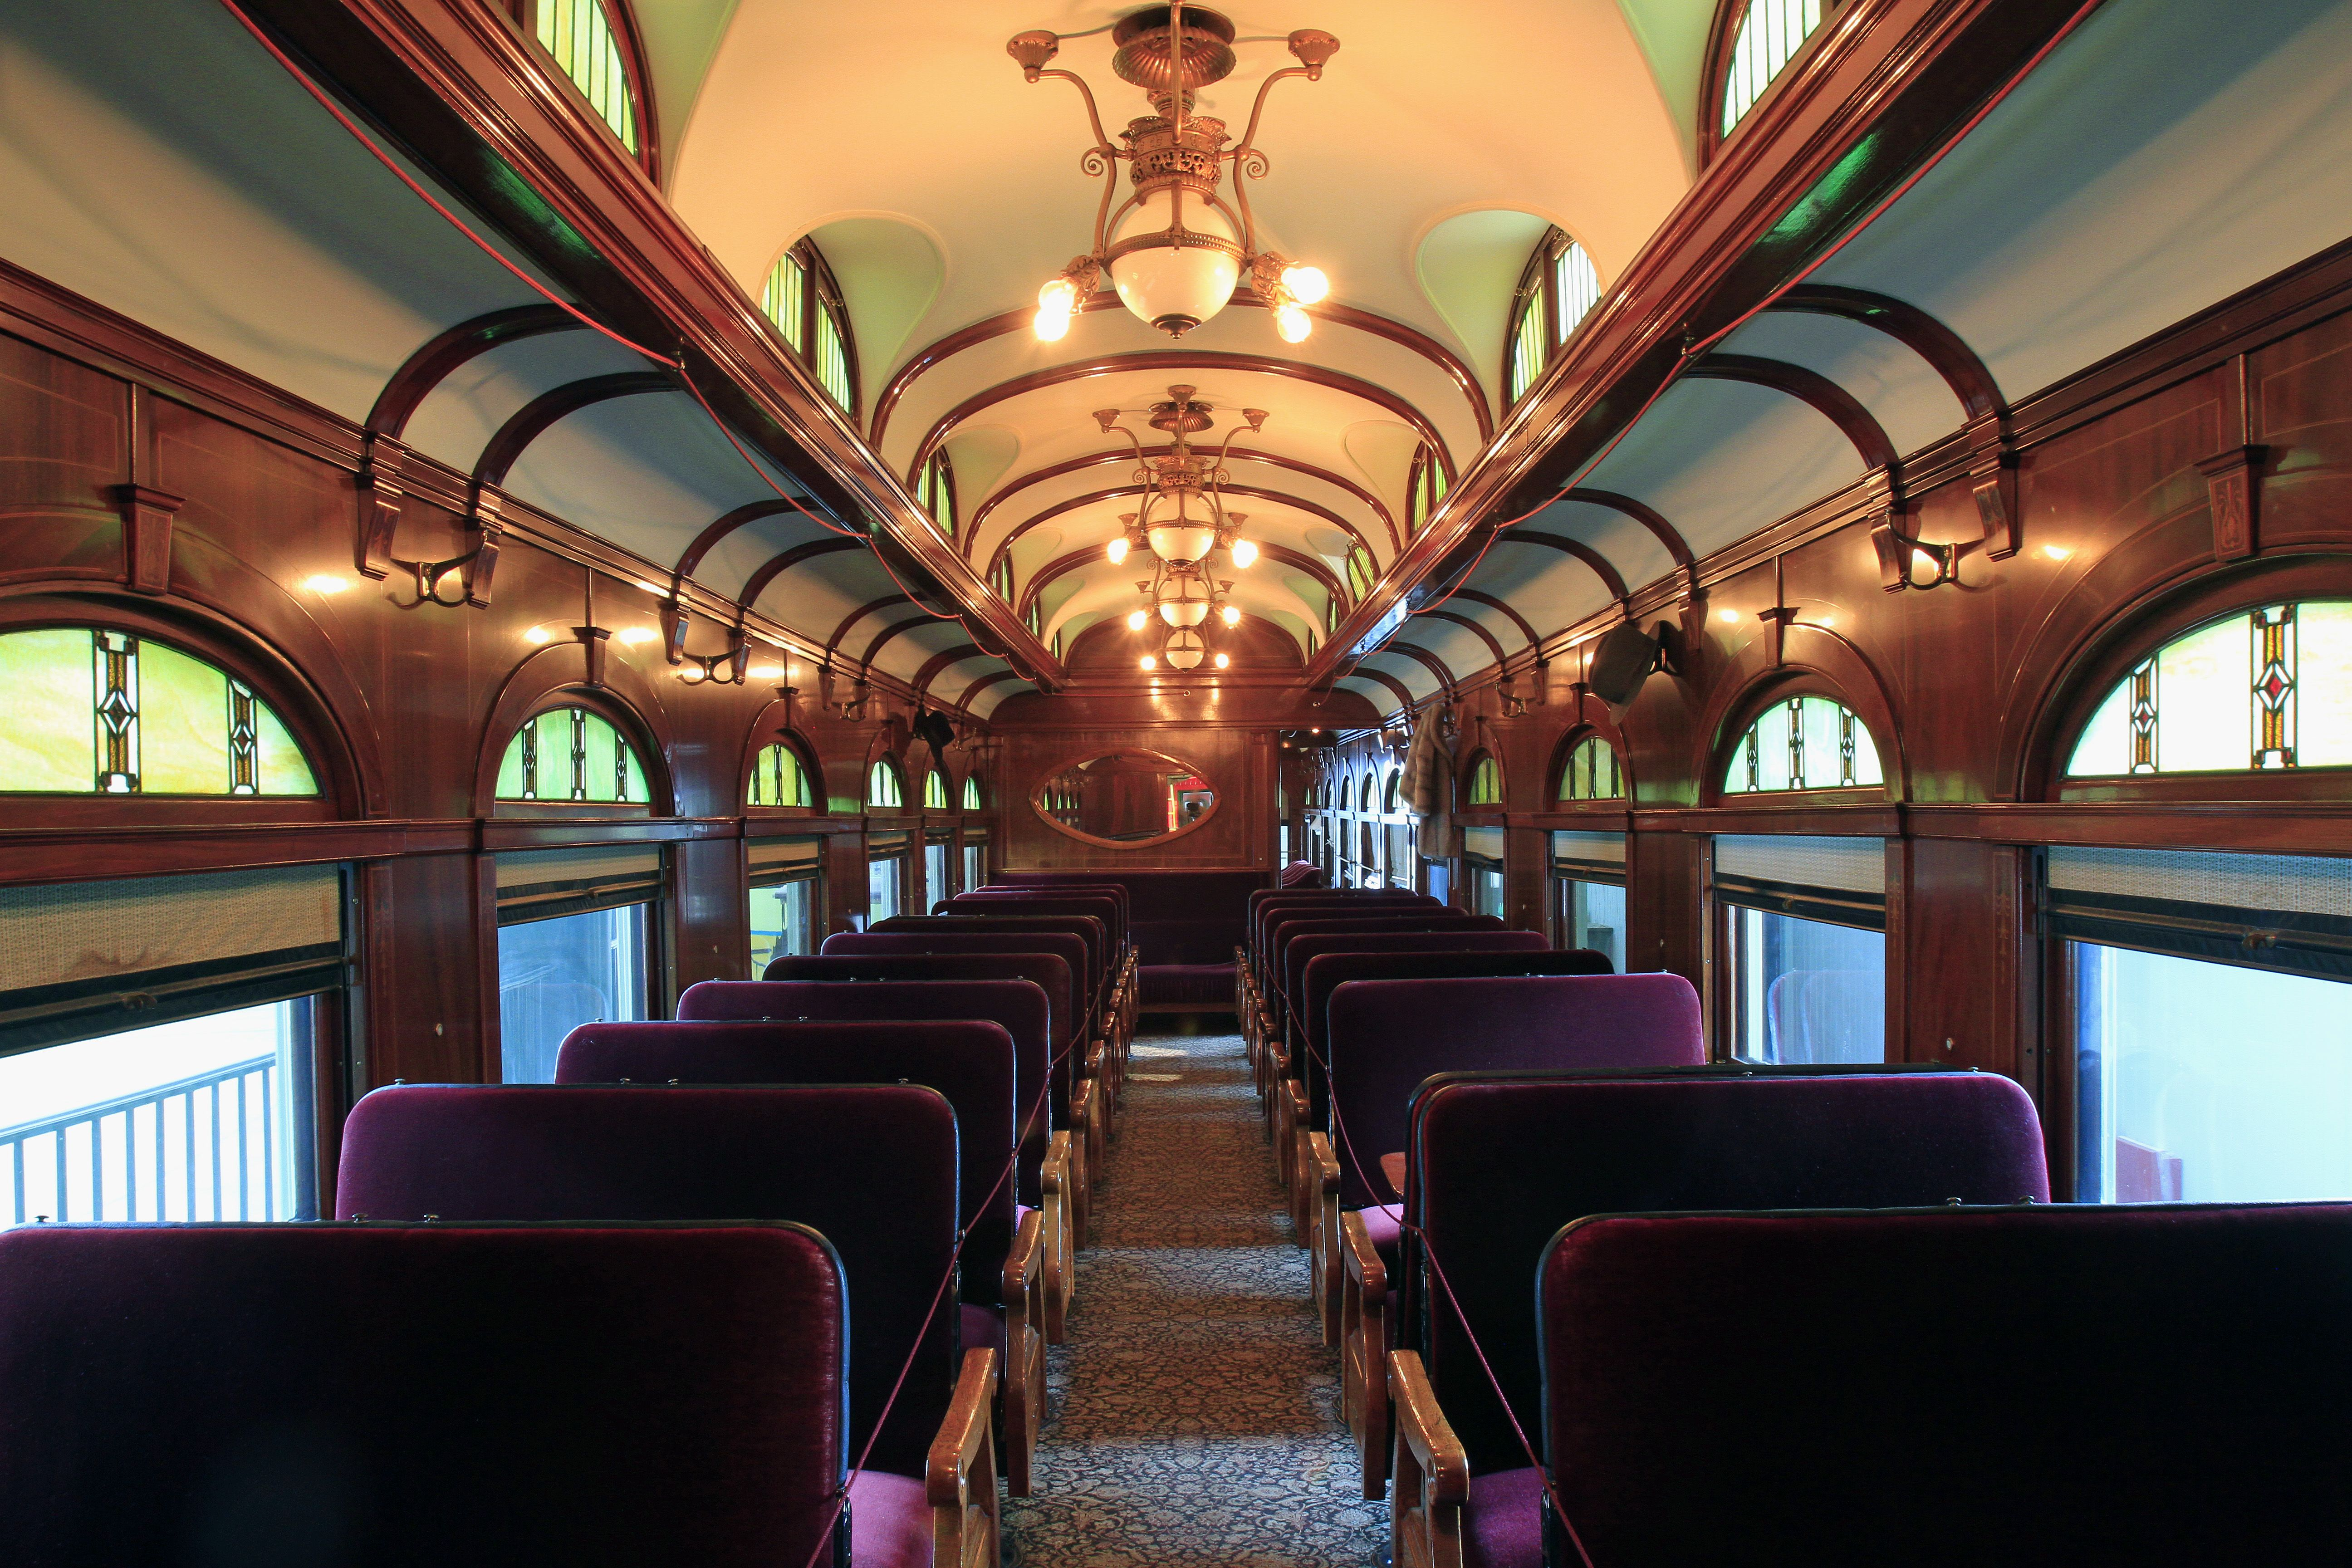 Barney & Smith rail car in The James F. Dicke Family